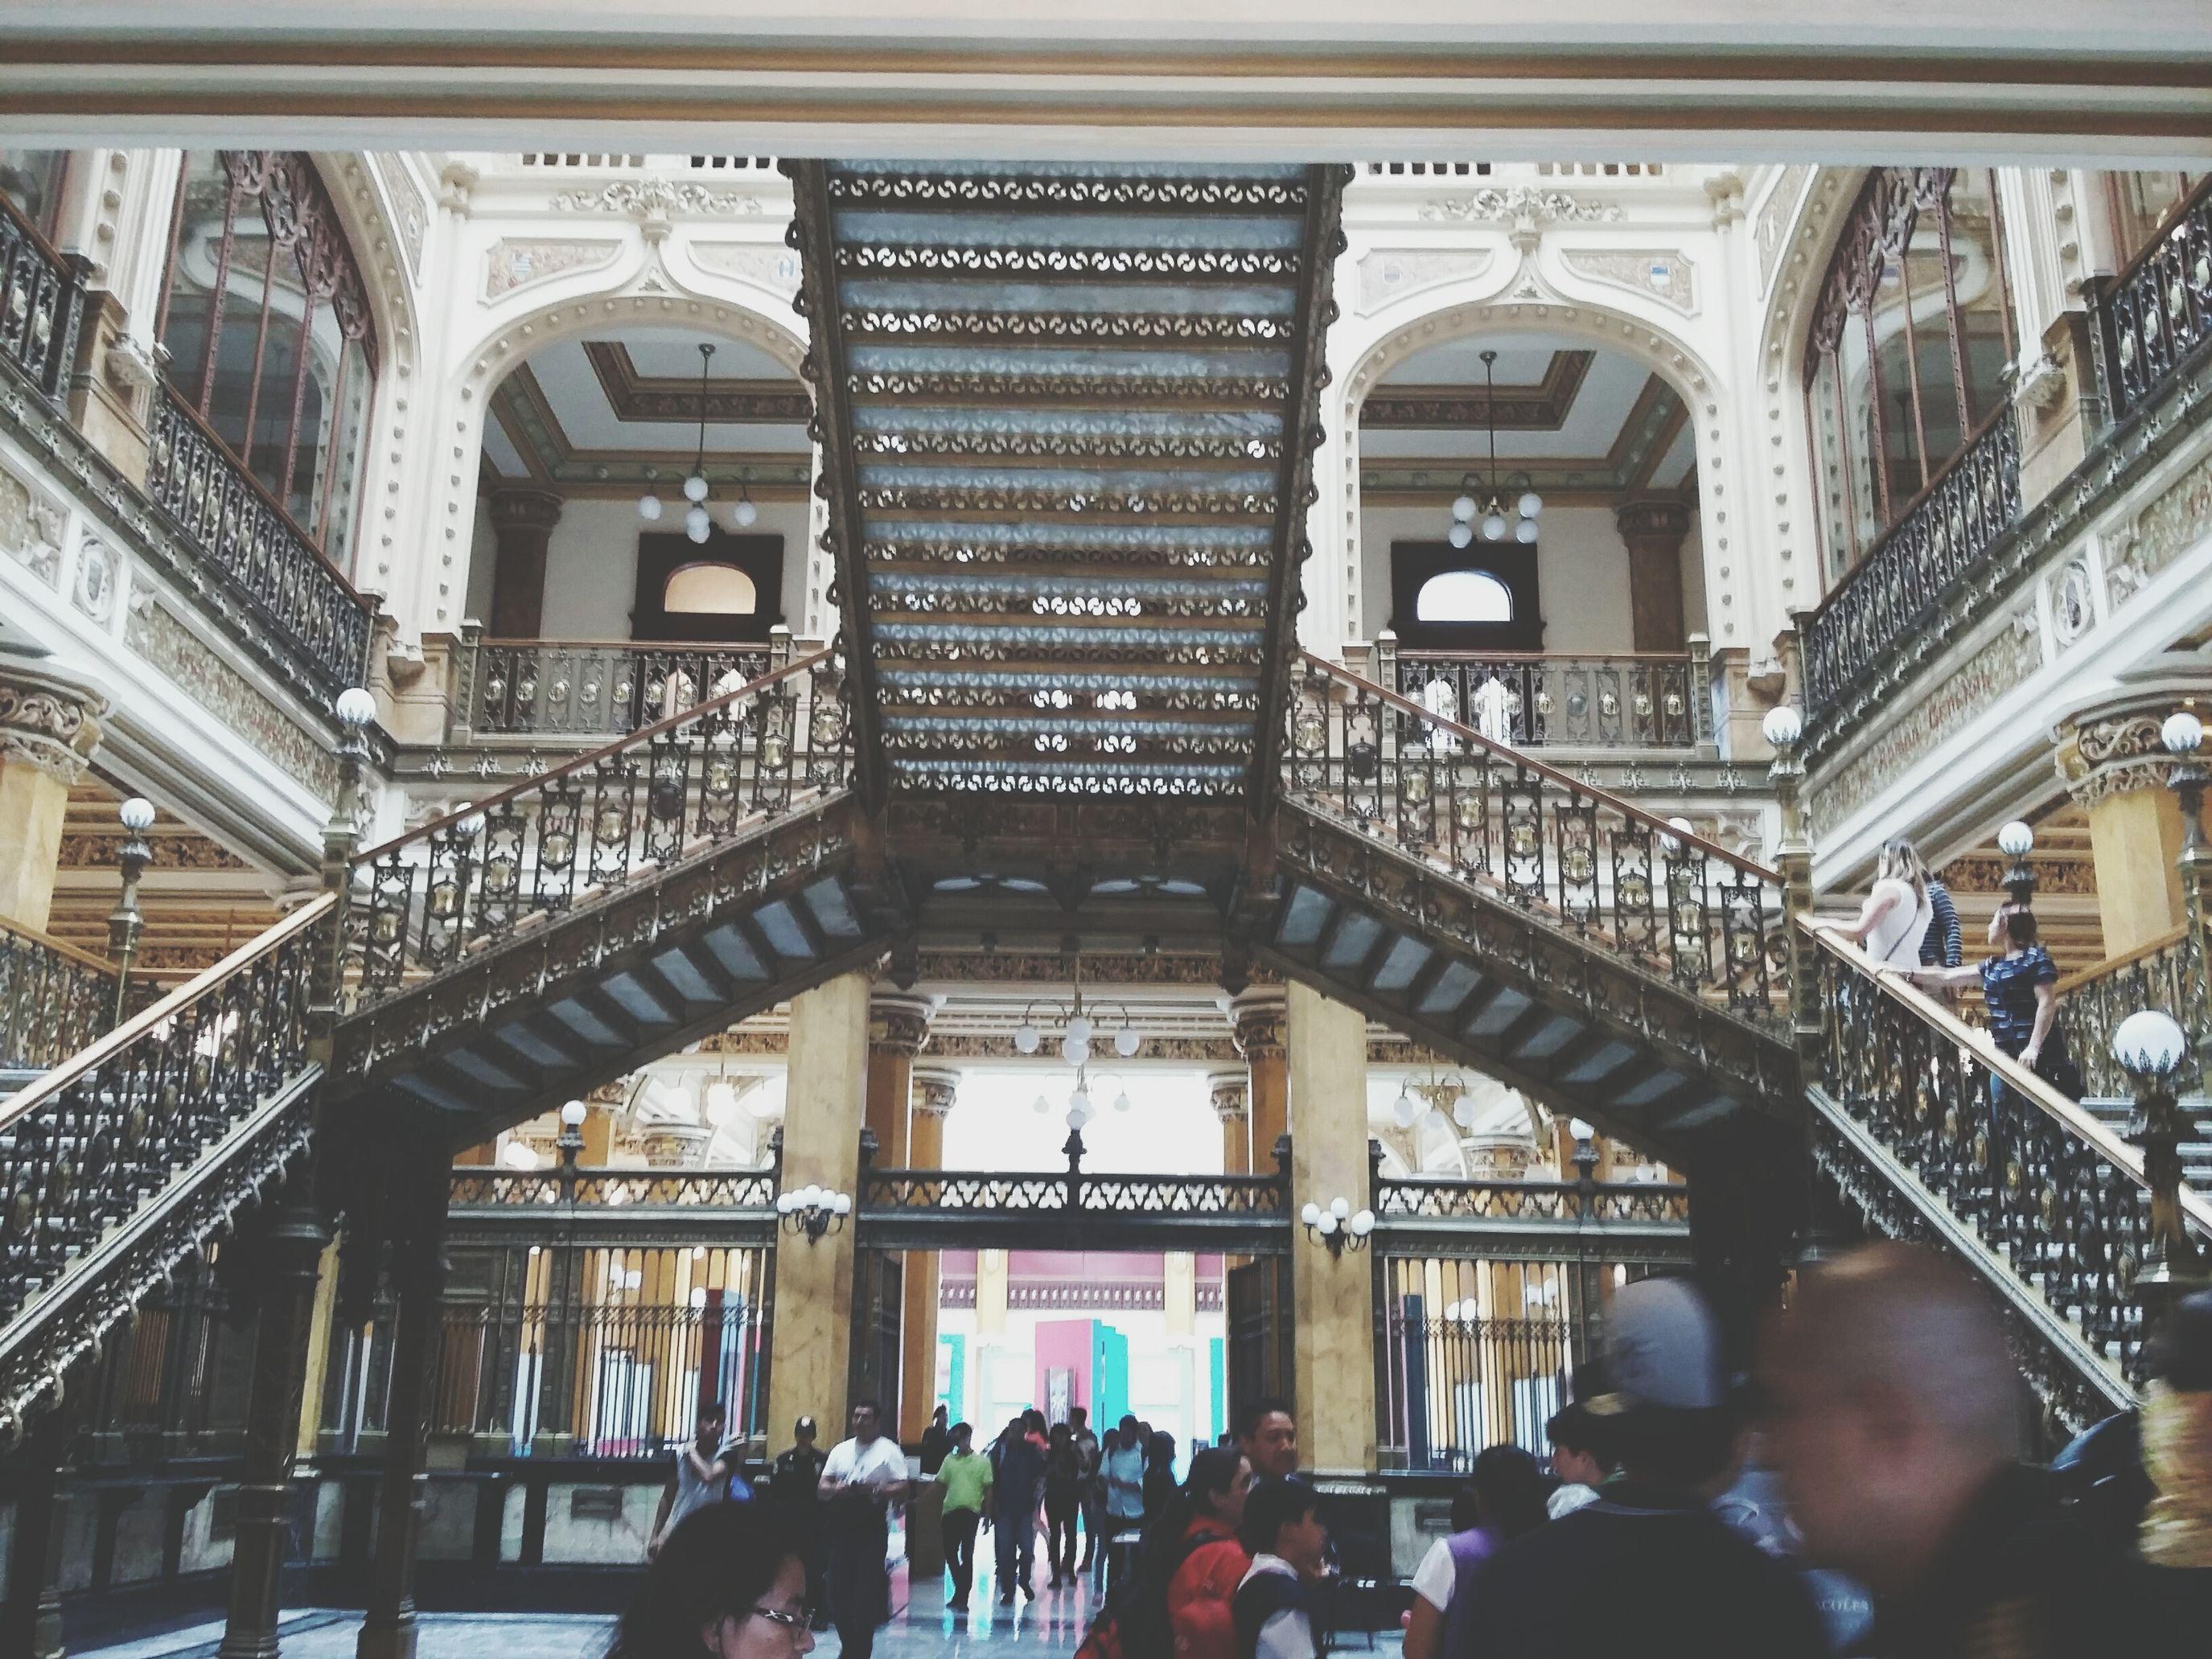 PalacioPostal PalacioDeCorreosDeMexico.